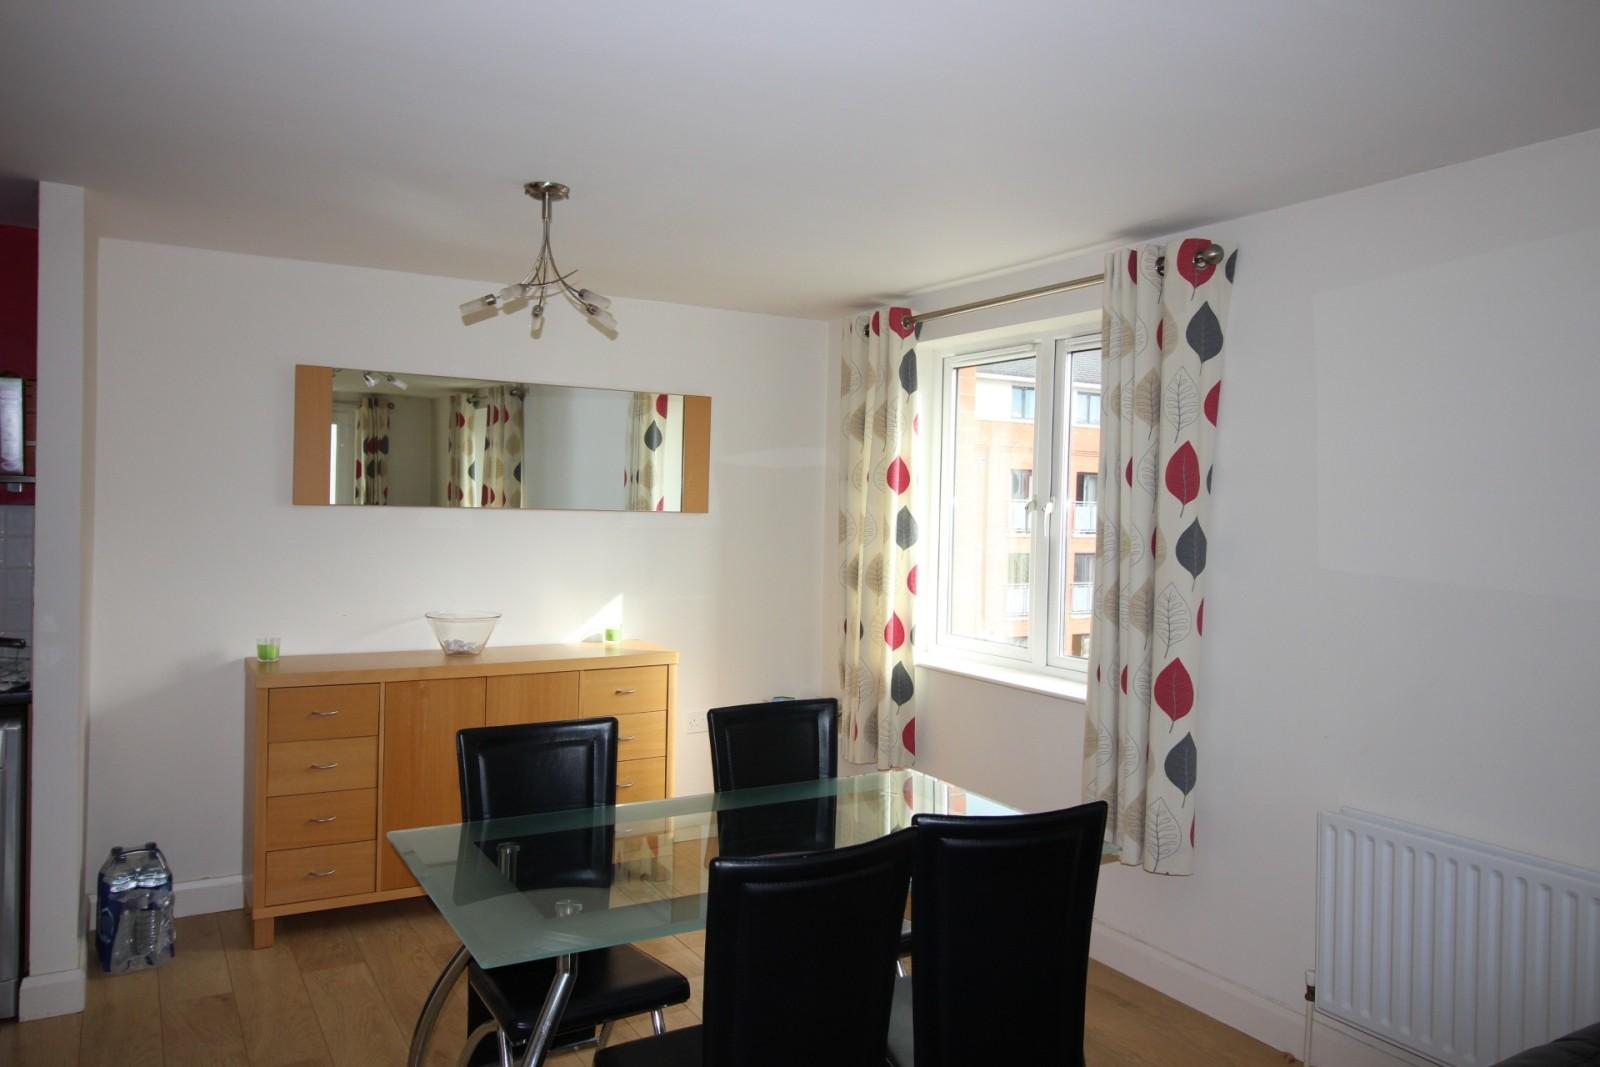 Miraculous Apartment 14 Dunmore Building Belfast Property For Rent At Home Interior And Landscaping Mentranervesignezvosmurscom